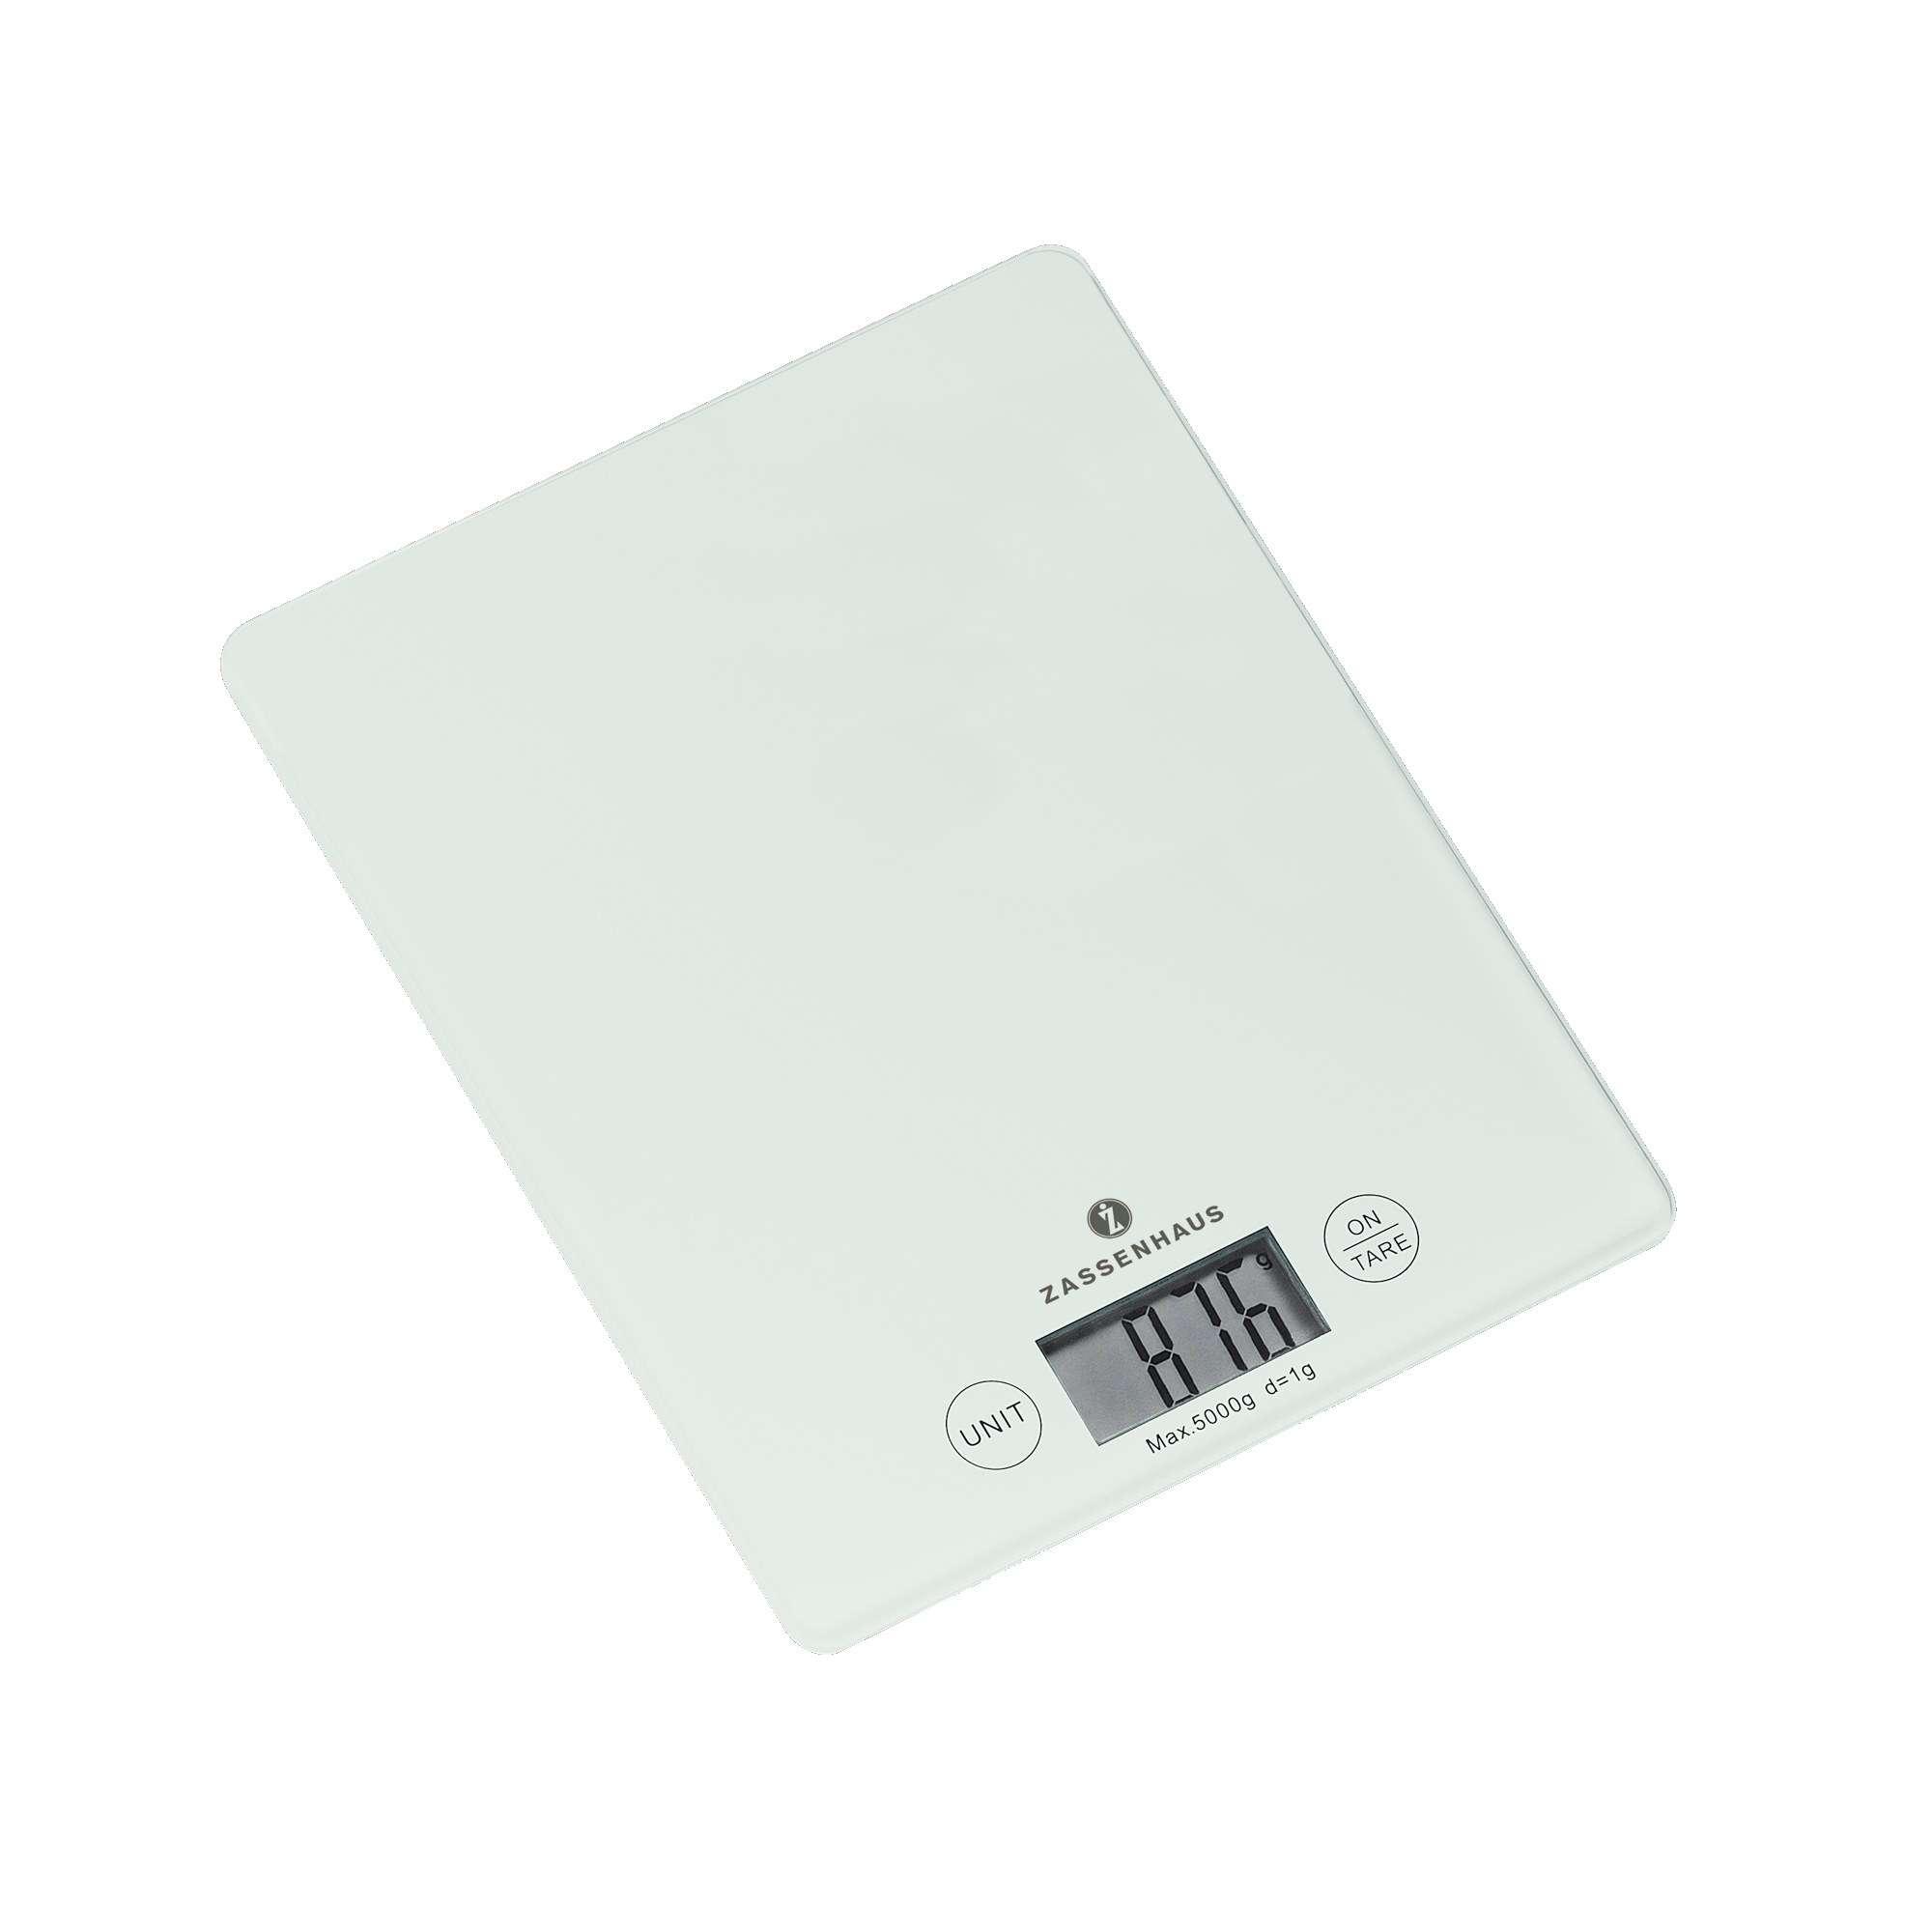 Zassenhaus Balance Digital Kitchen Scales White Scales Measuring